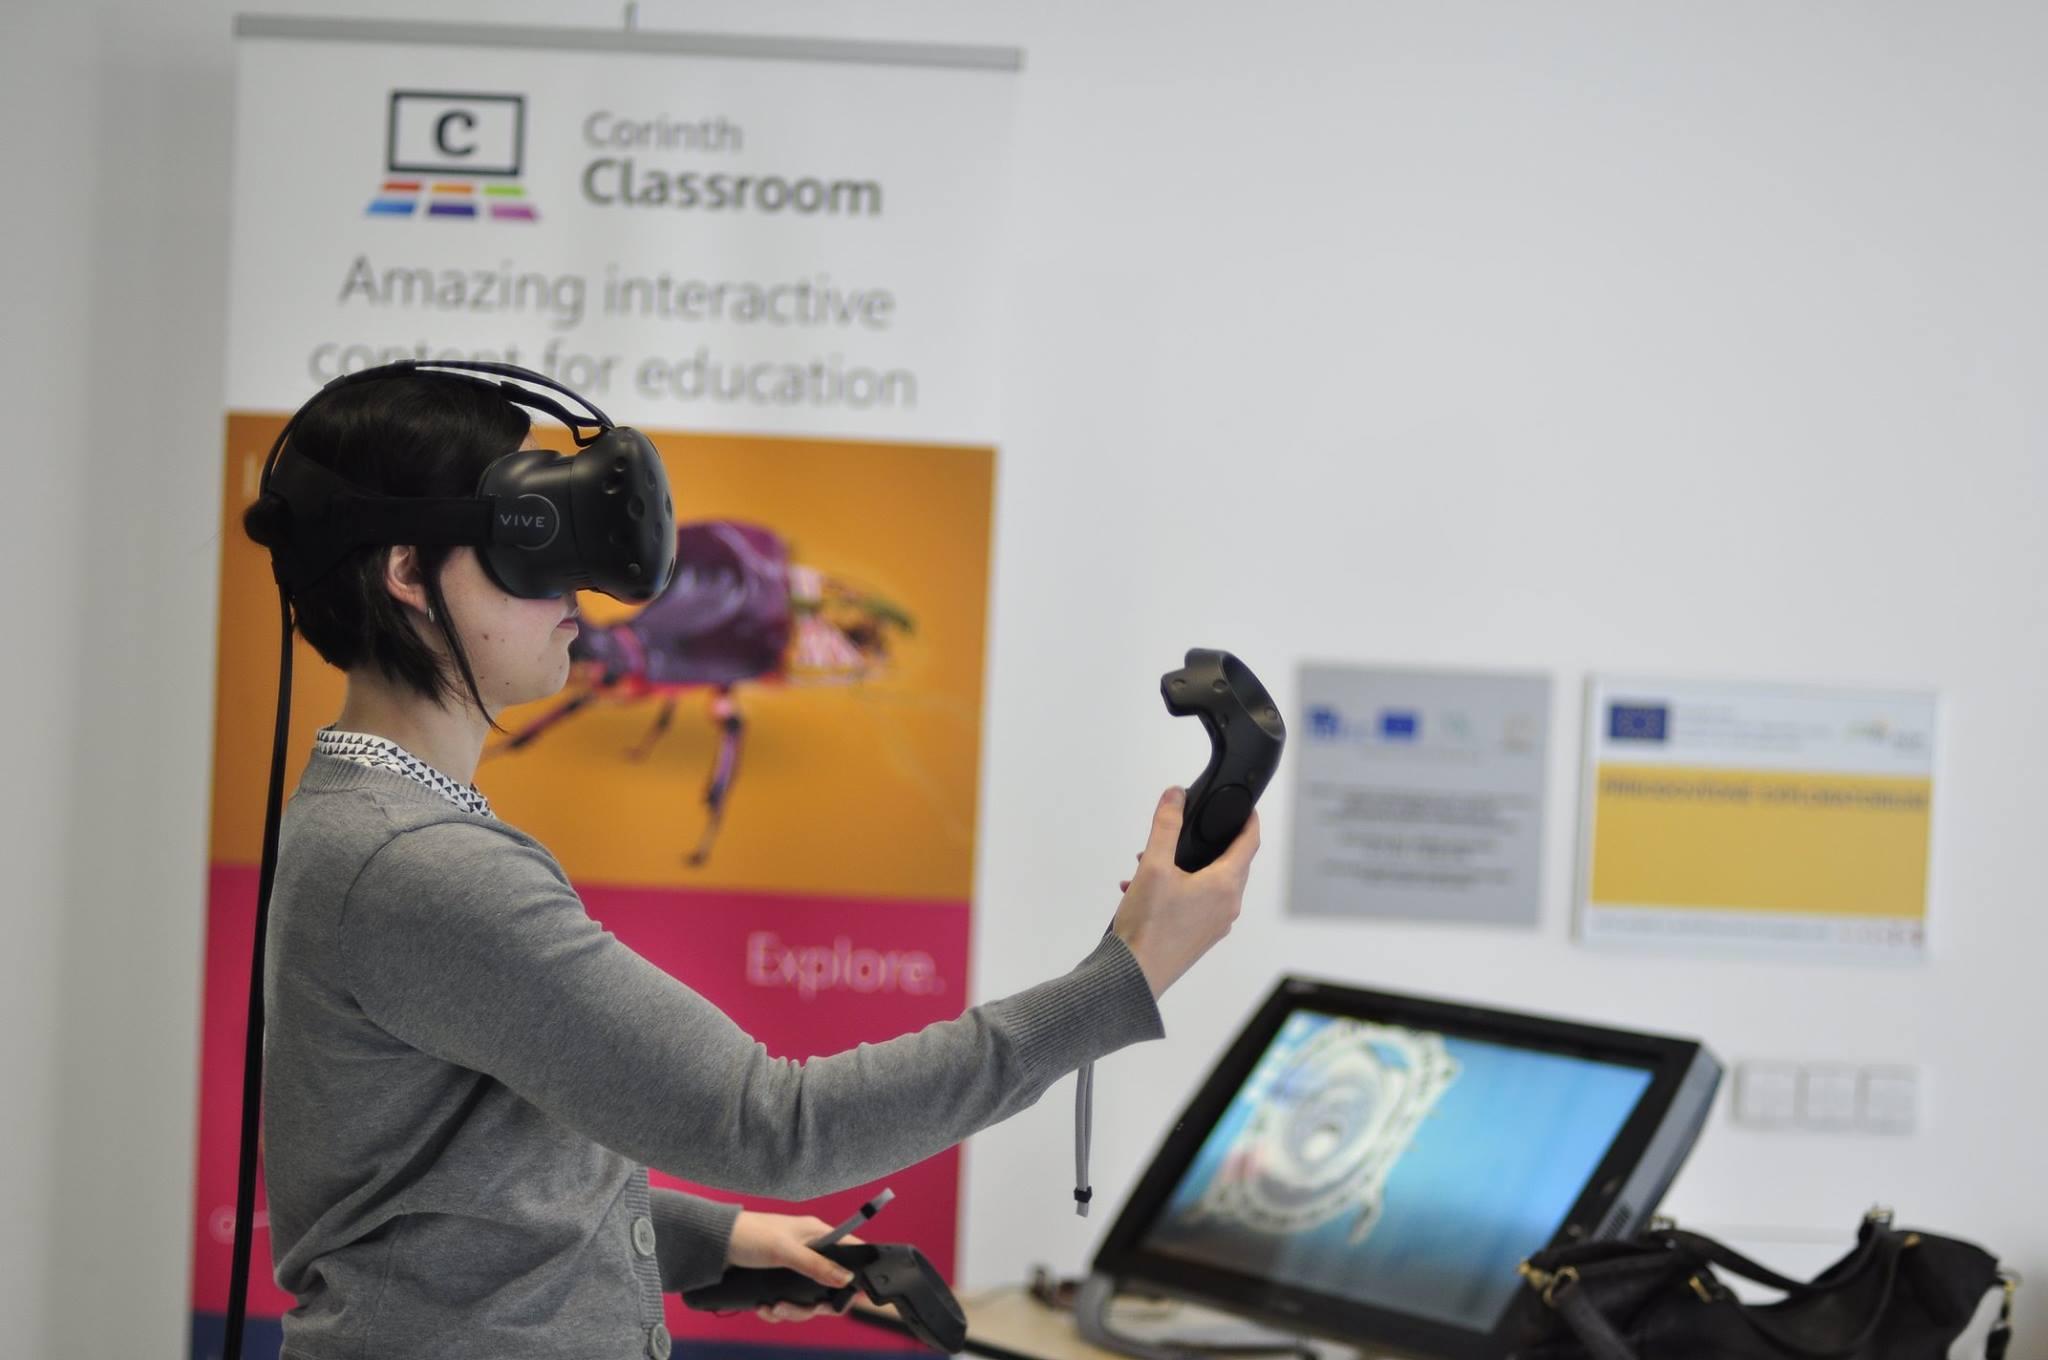 Corinth - Corinth Blog - Corinth introduces first VR